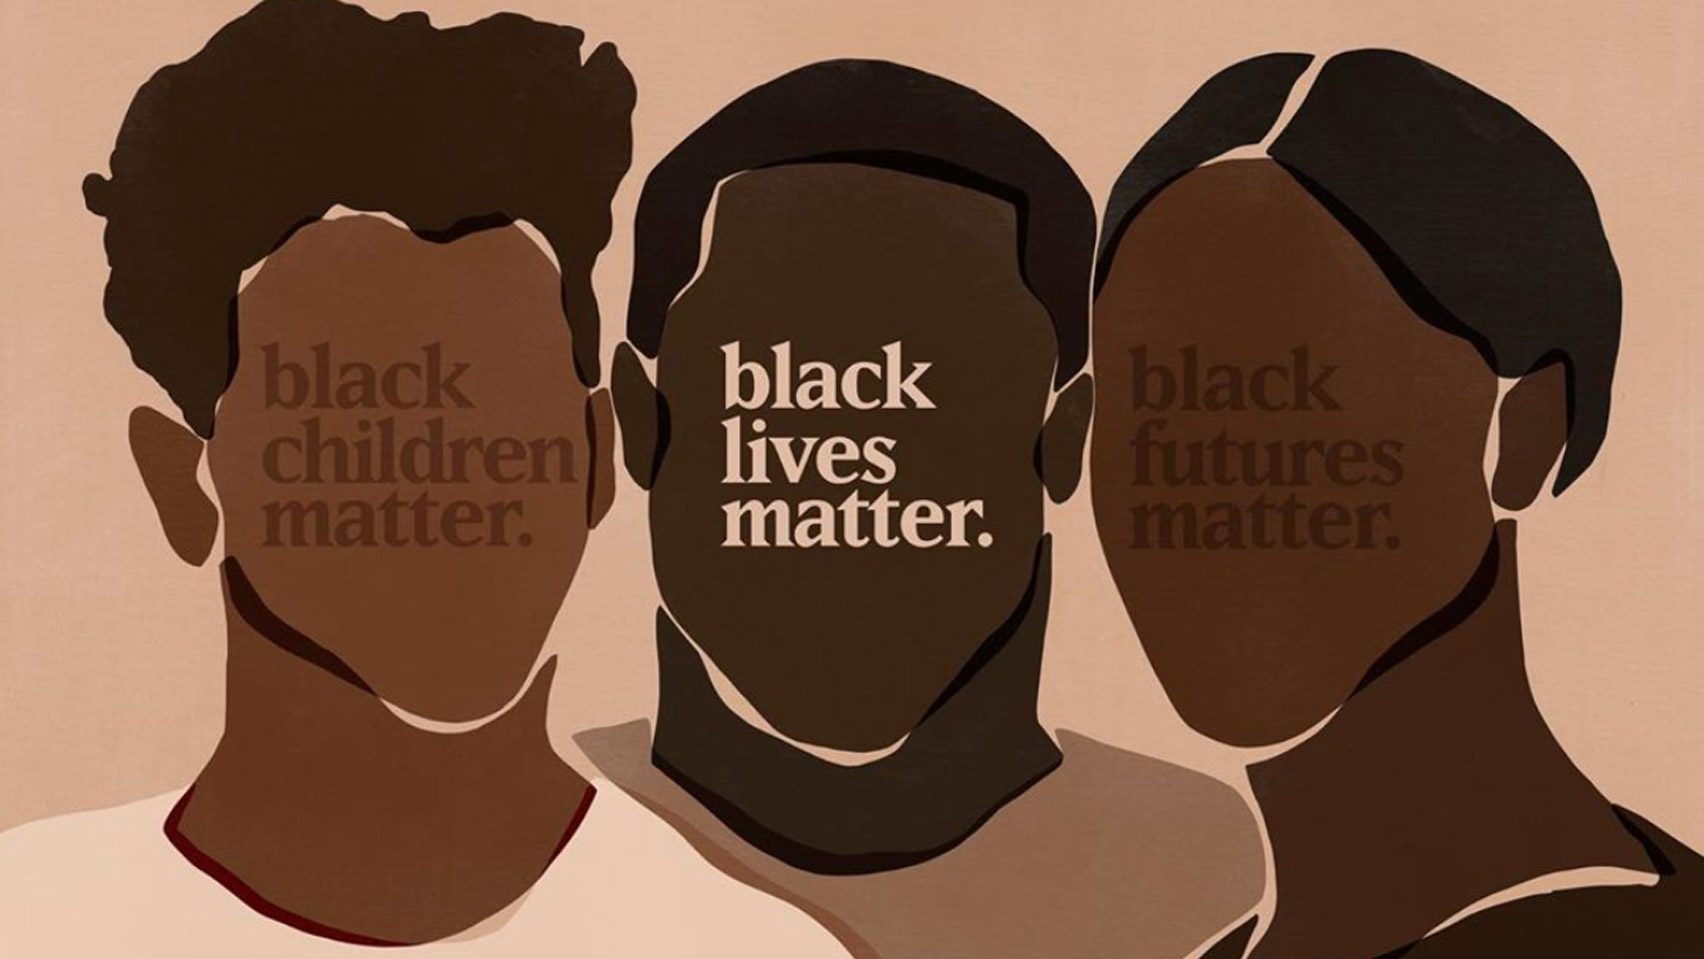 black-lives-matter-illustrations-roundup-hero-1